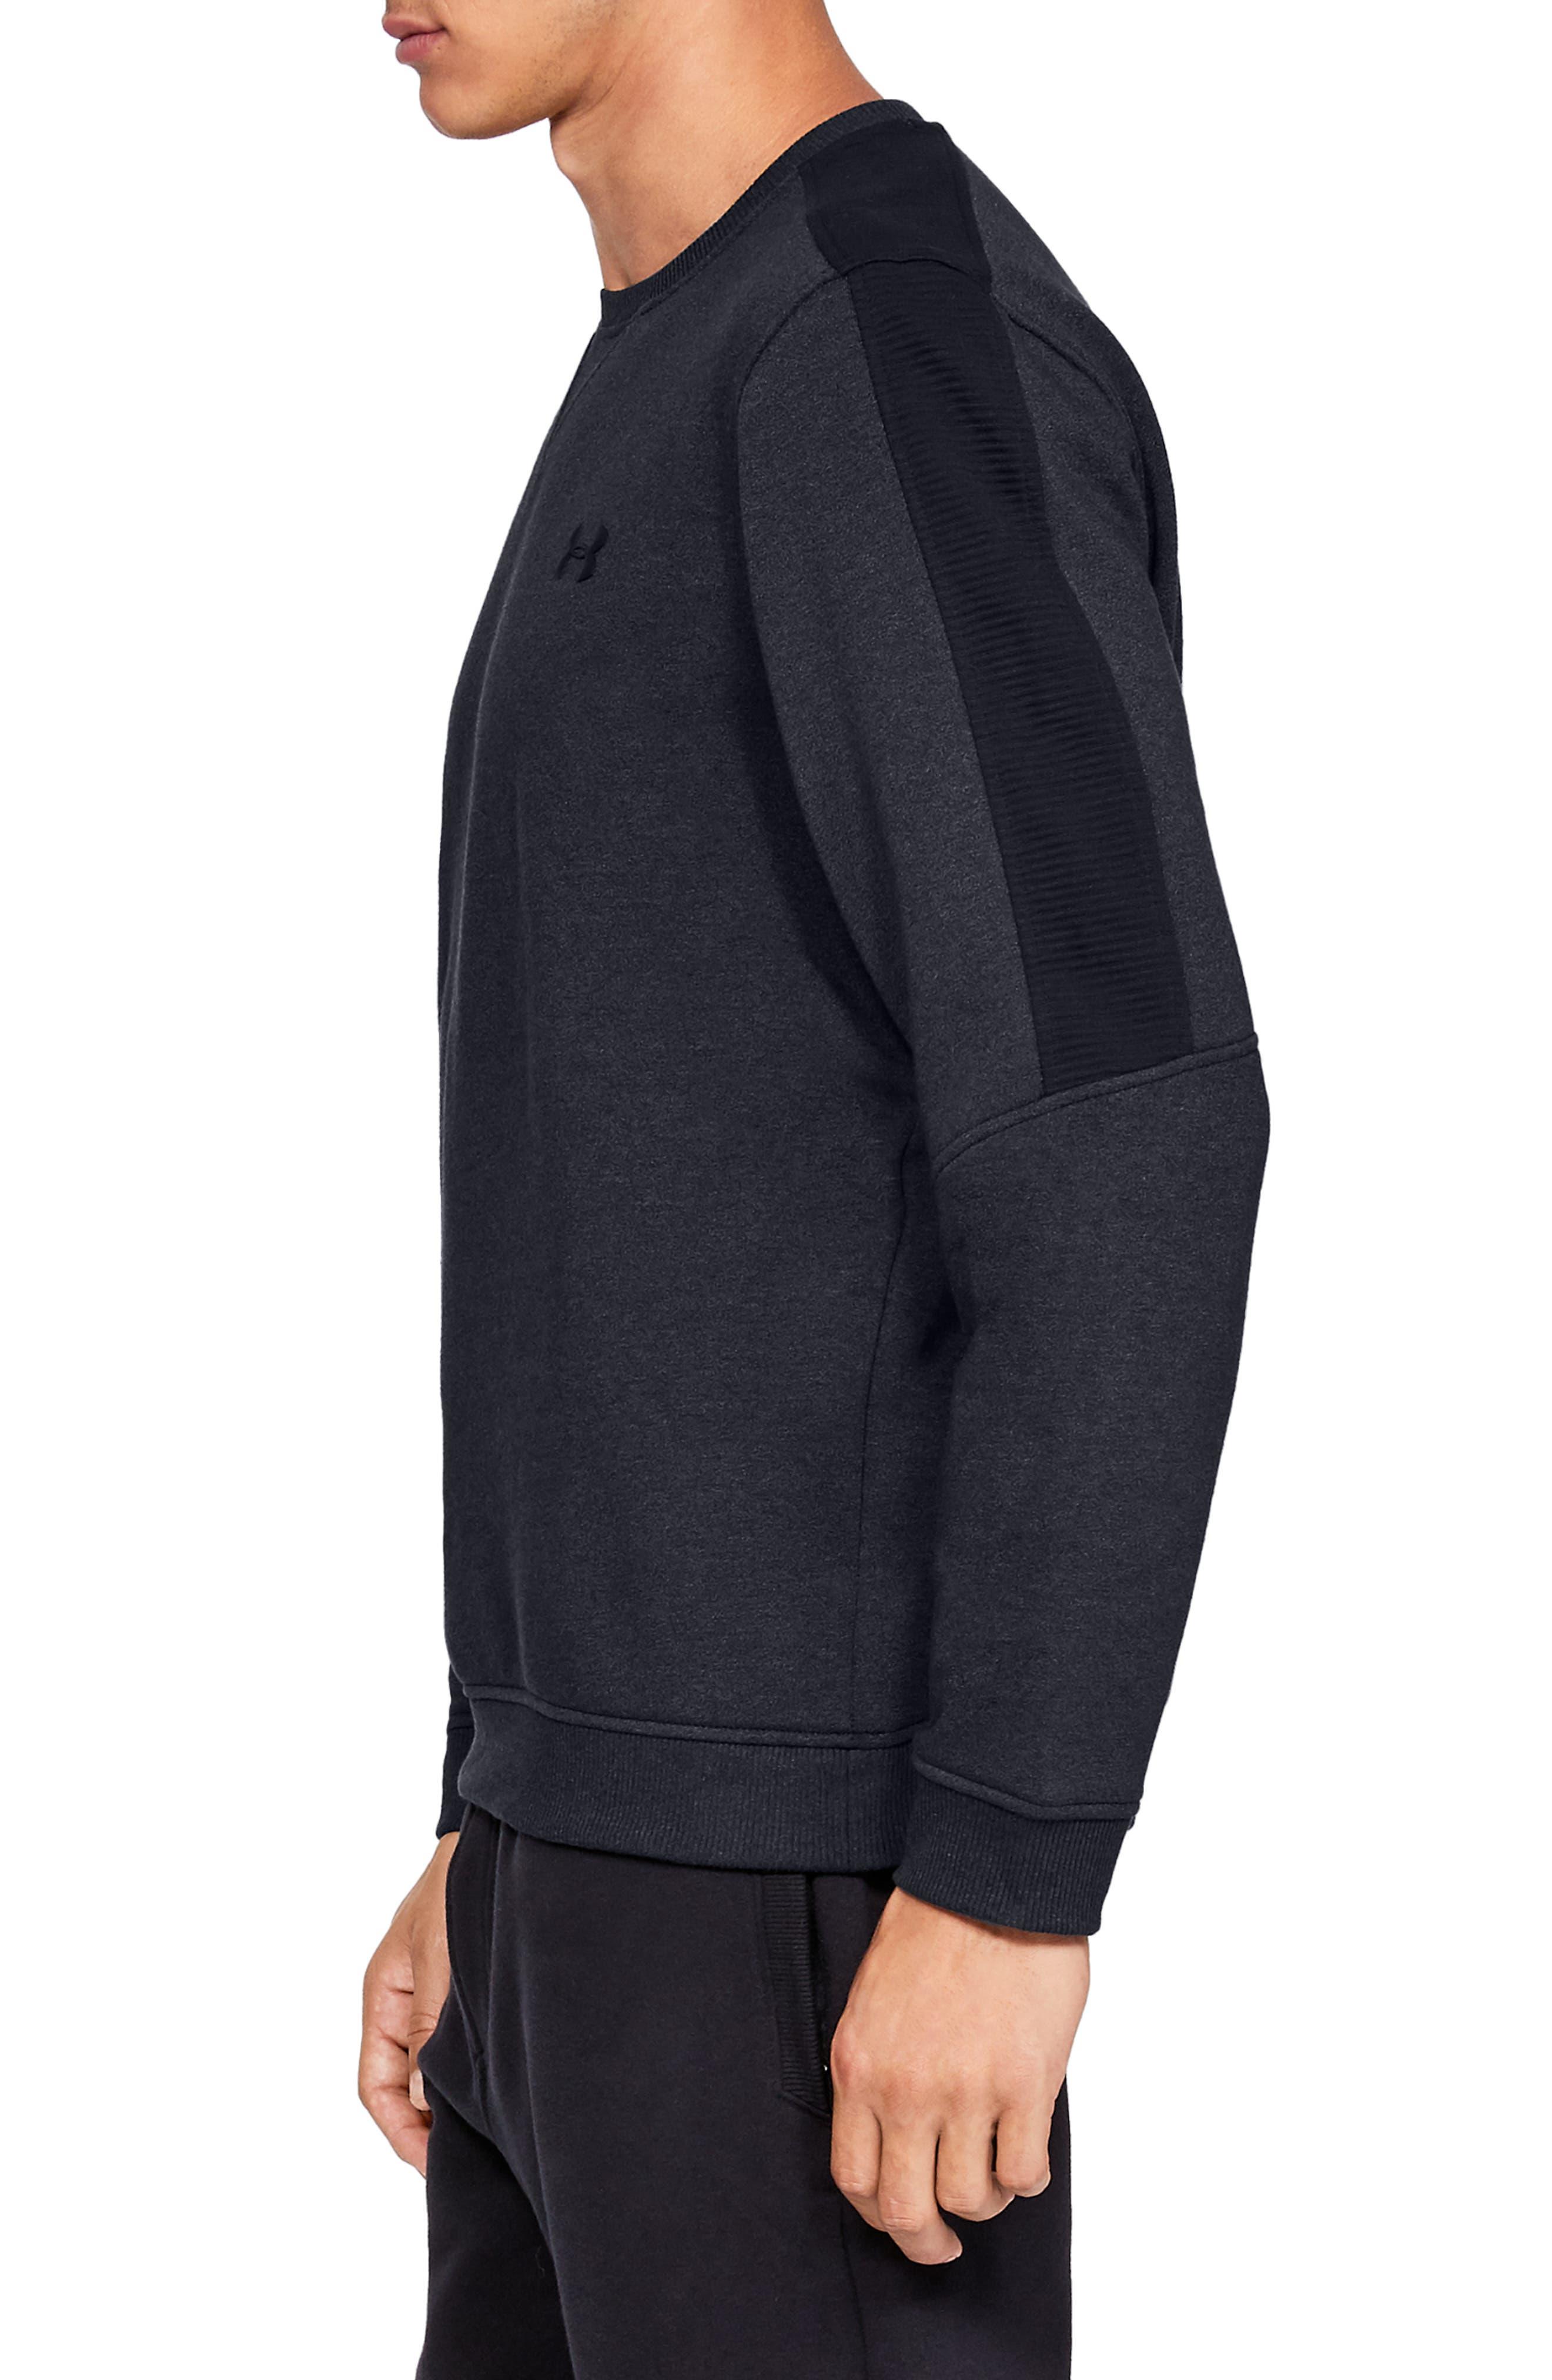 Threadborne Siro Fleece Crewneck Sweatshirt,                             Alternate thumbnail 3, color,                             BLACK/ BLACK/ BLACK